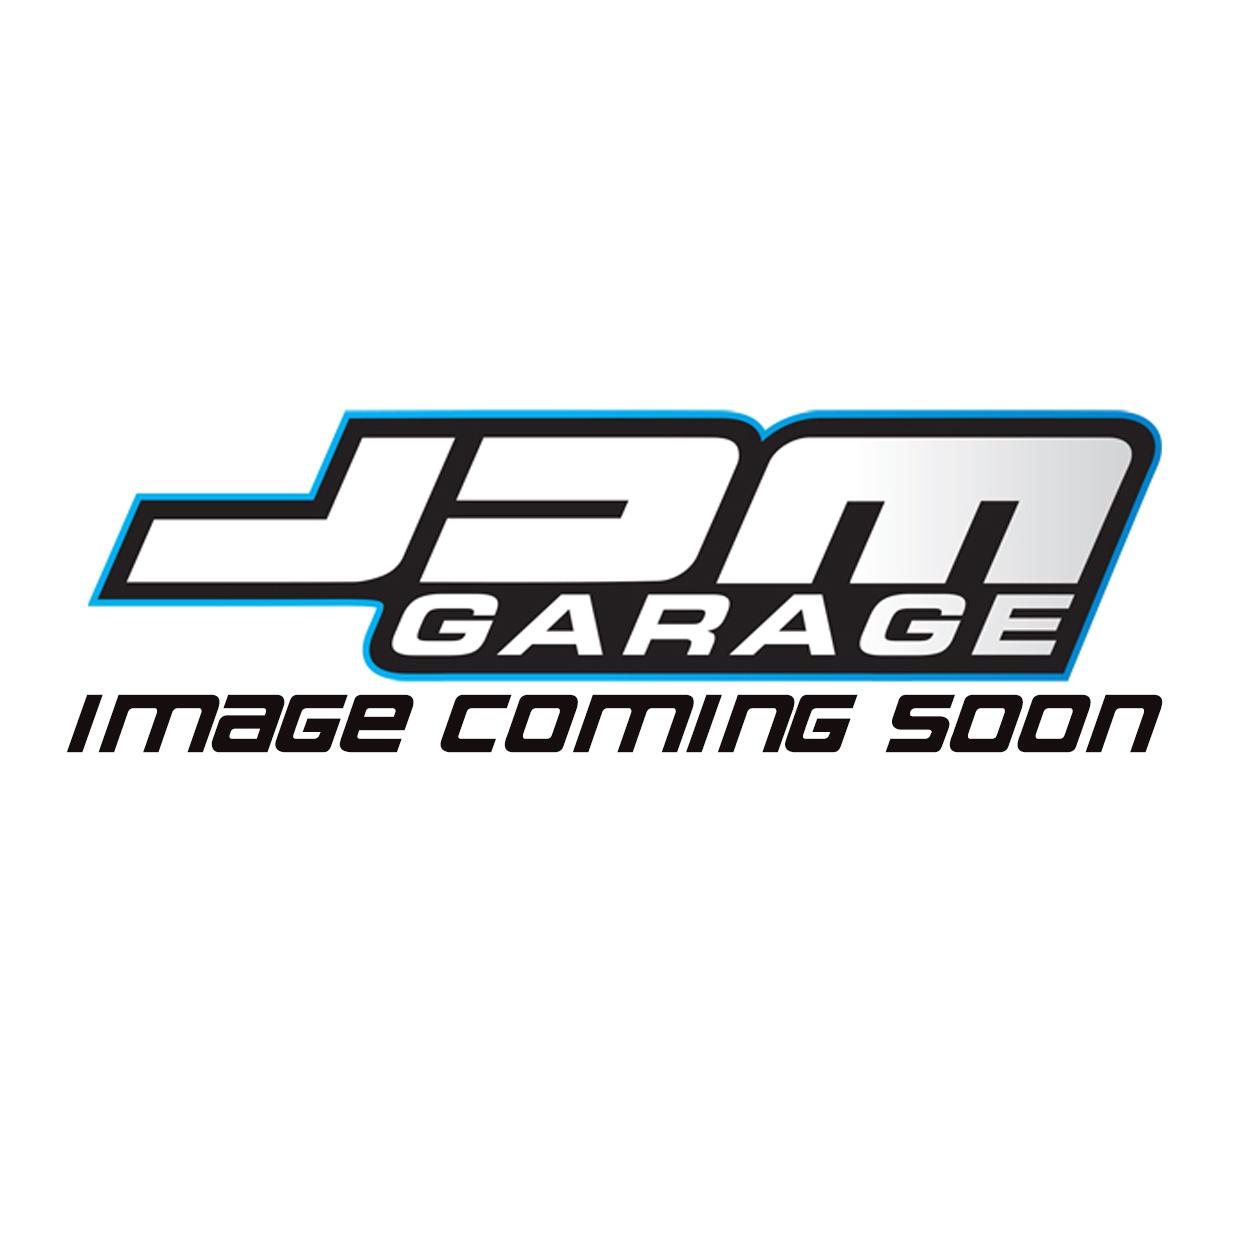 Genuine Nissan OEM Crankshaft Gear Sprocket For Skyline R32 R33 R34 GTR RB26DETT 13021-05U10